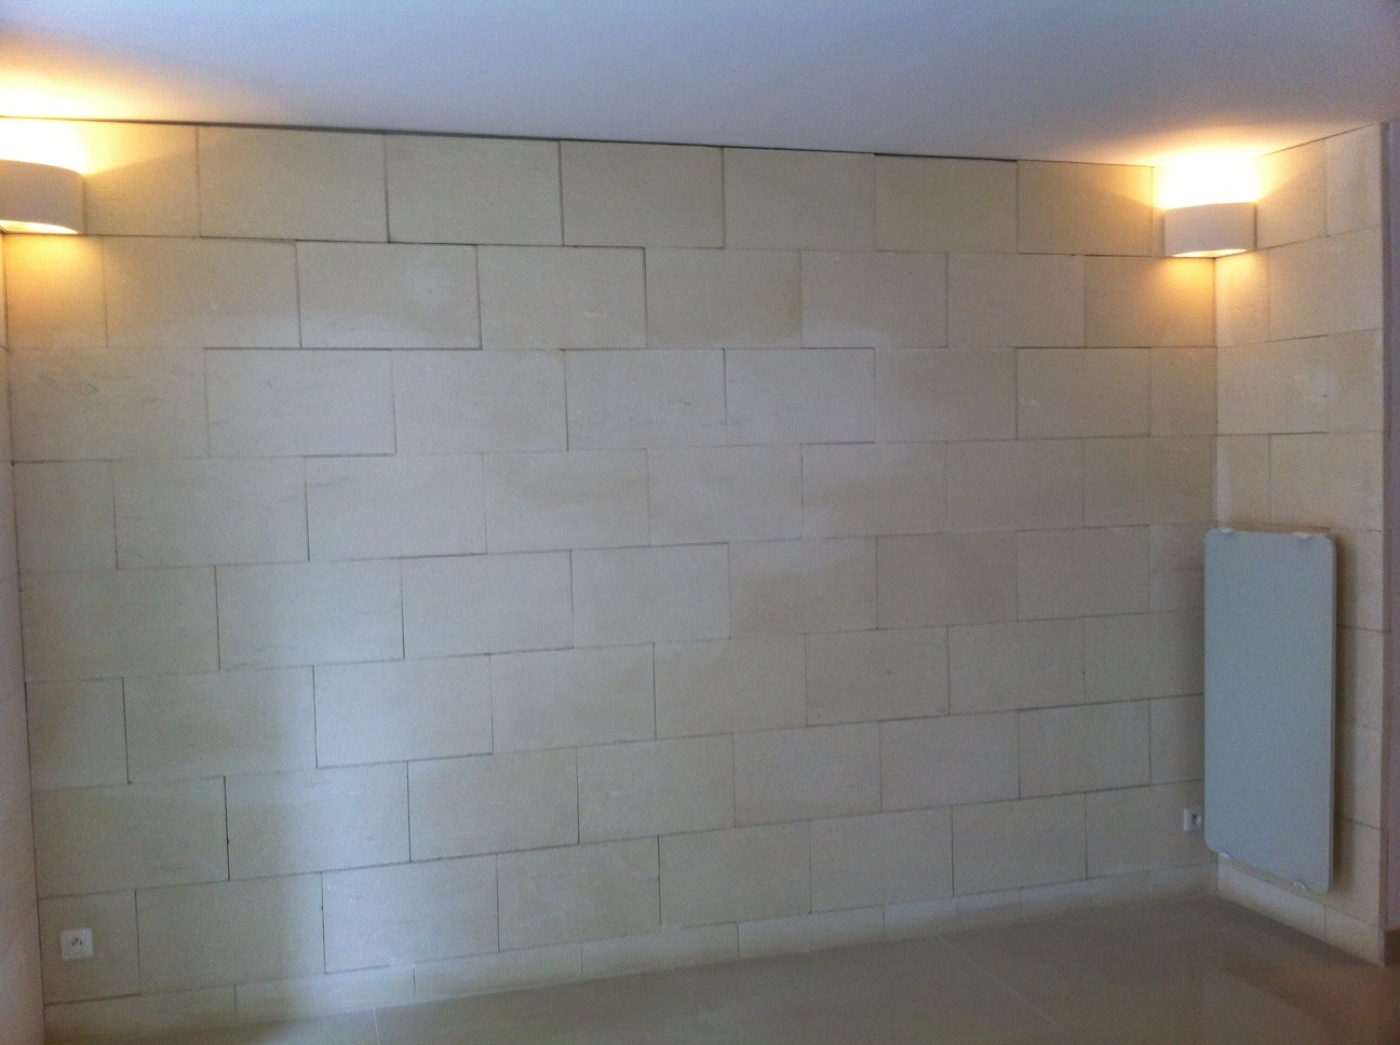 Mur en Pierre de Beaulieu finitnio brute. Chantier à marseille